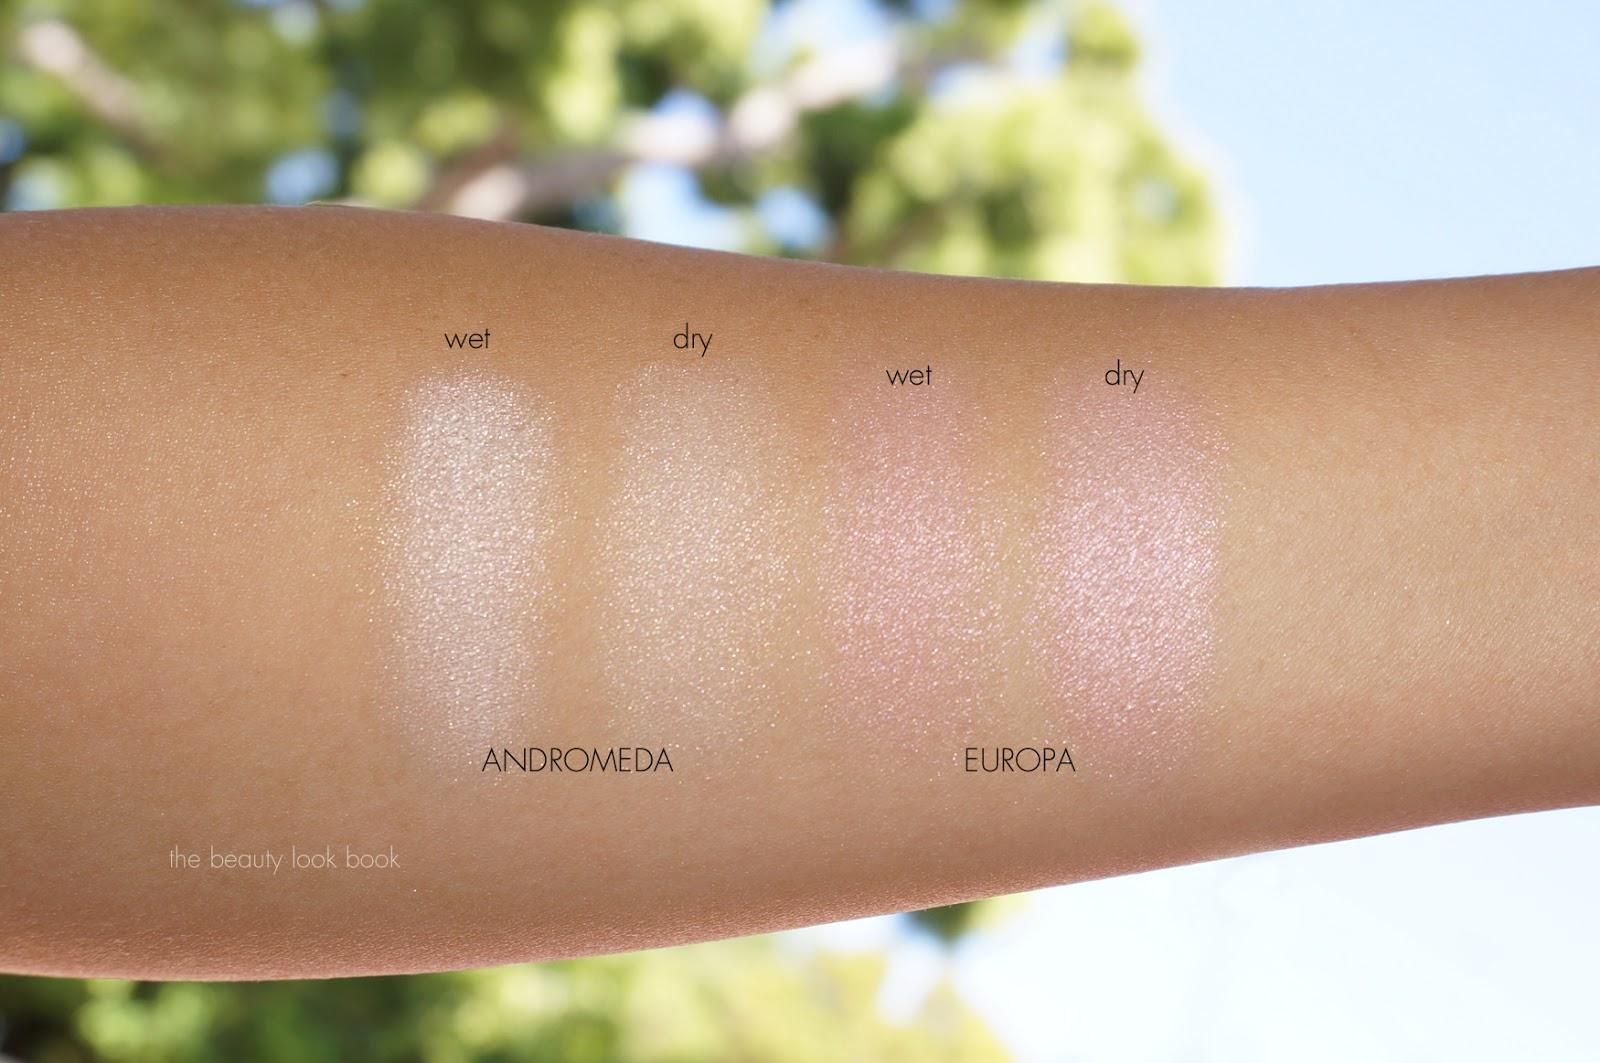 NARS Dual-Intensity Eyeshadow | Andromeda and Europa